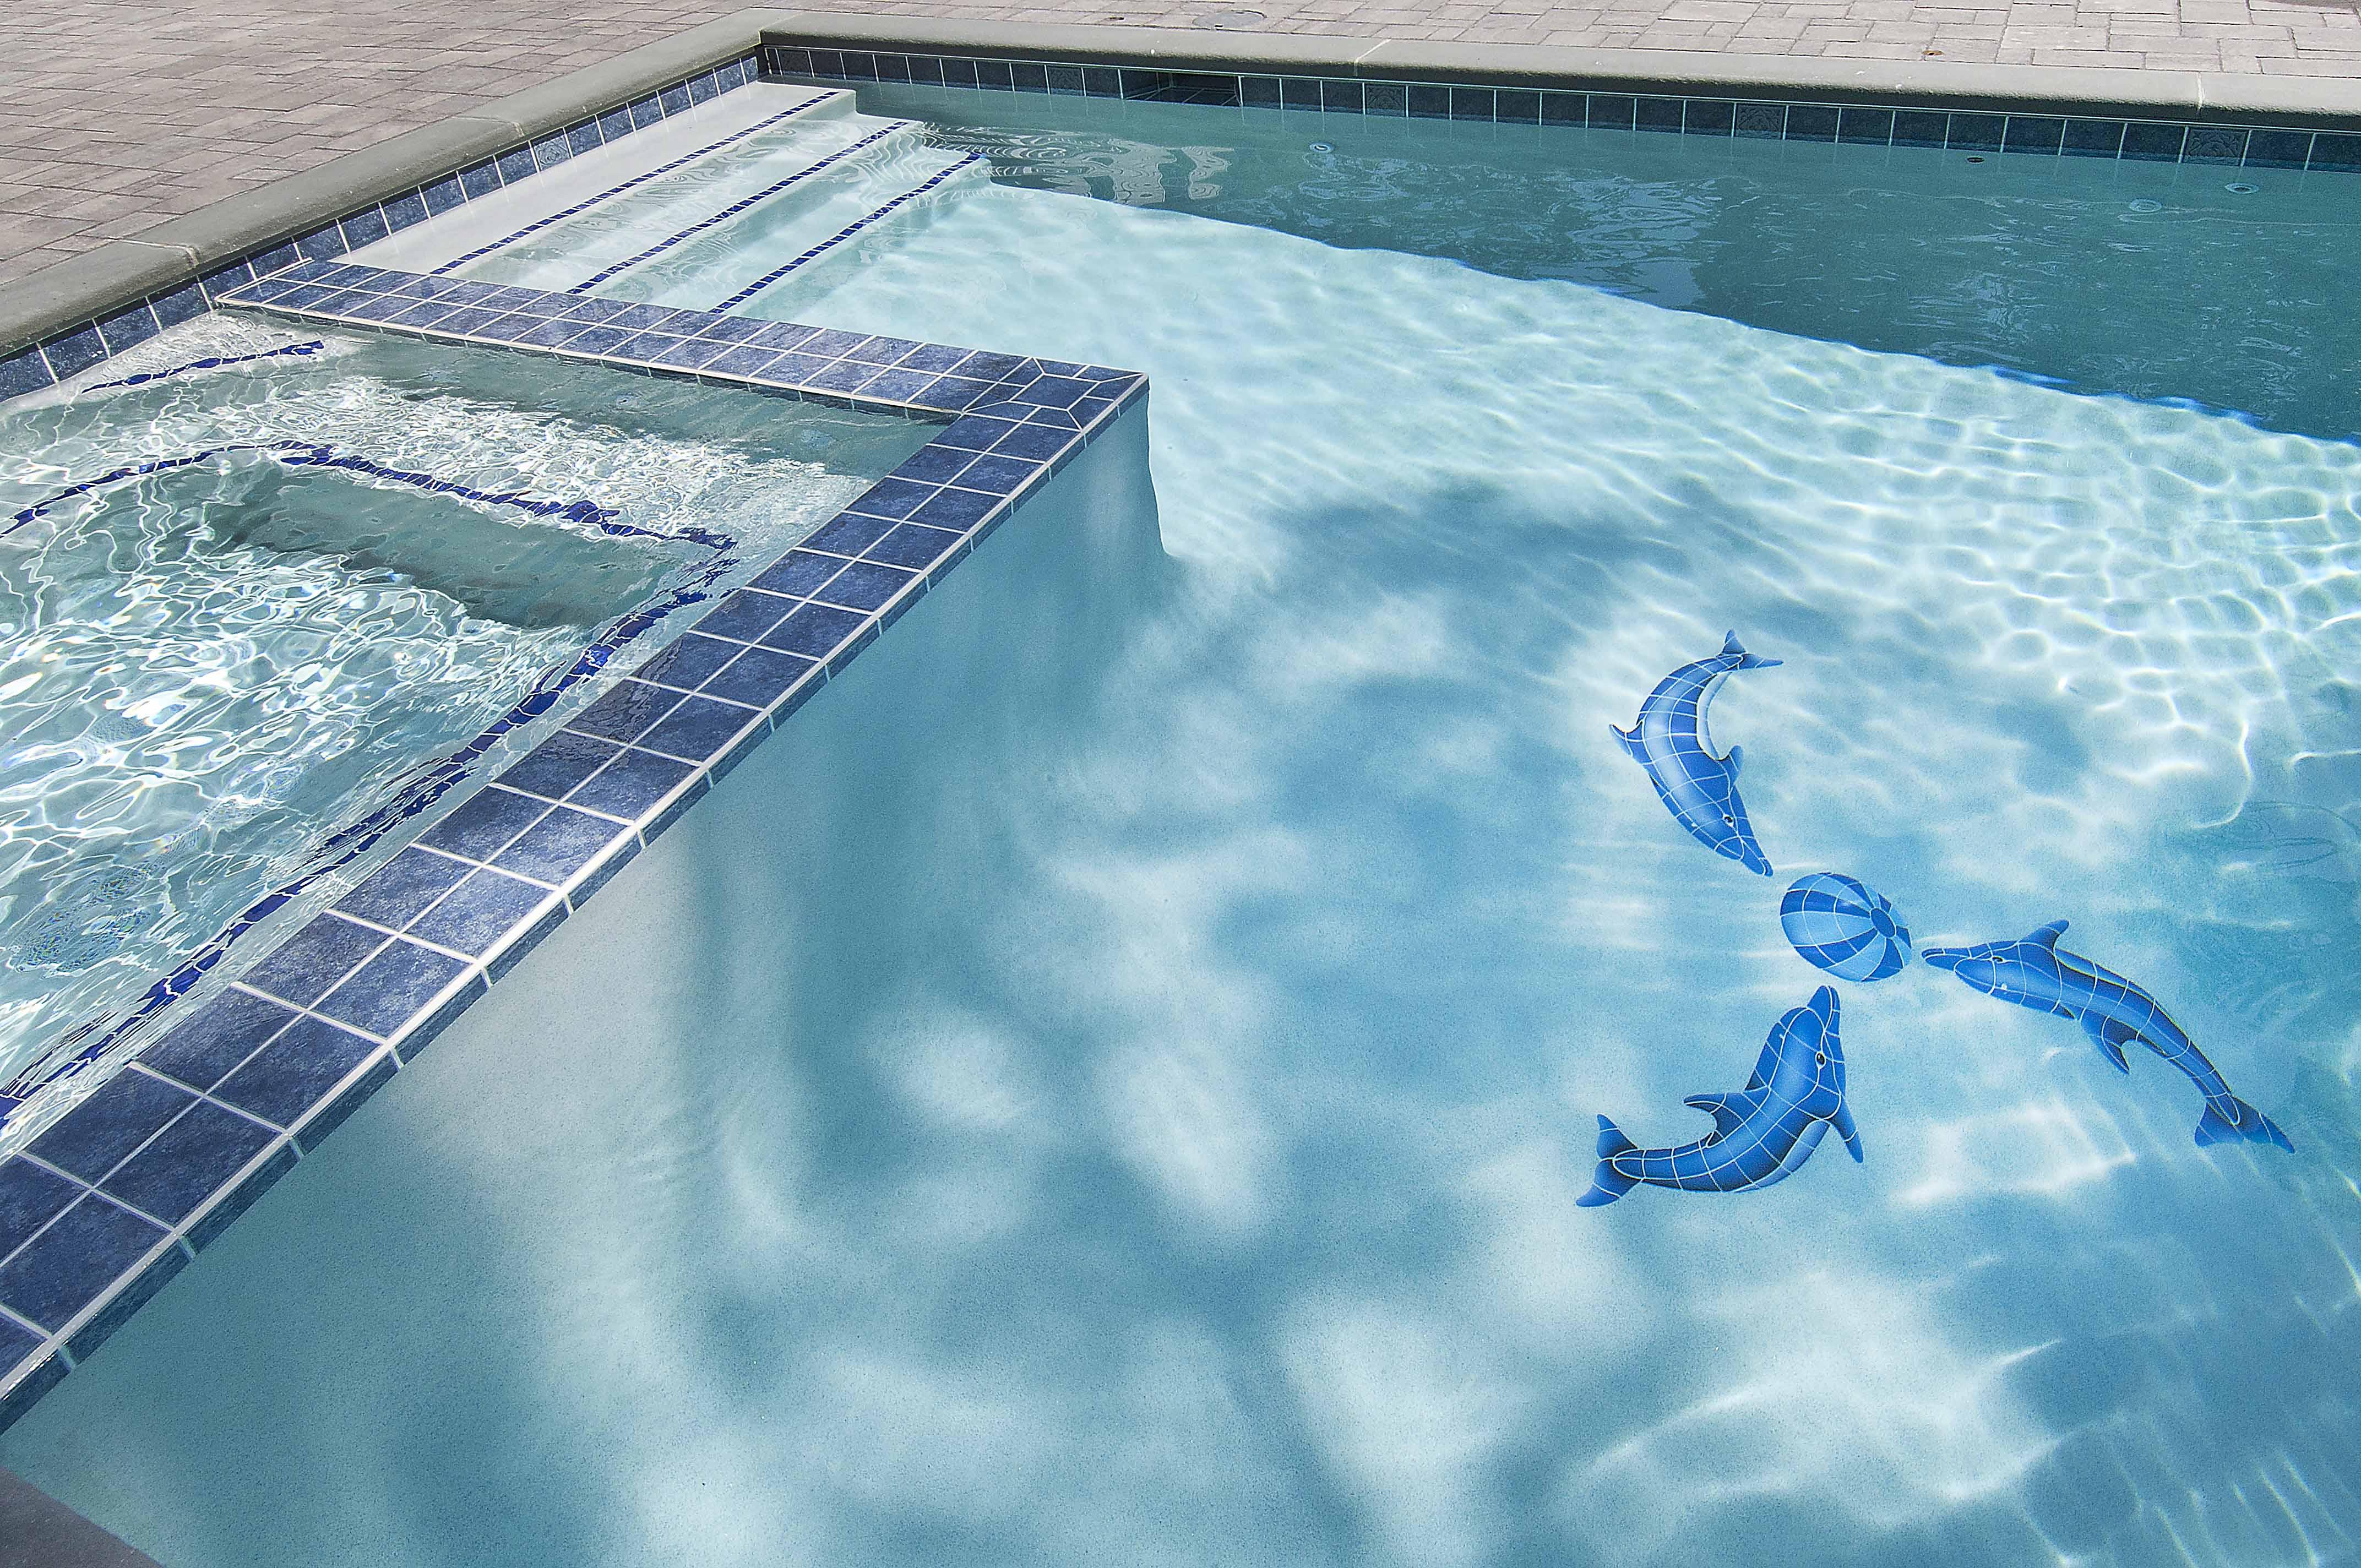 Shoreline Pools pool tiling